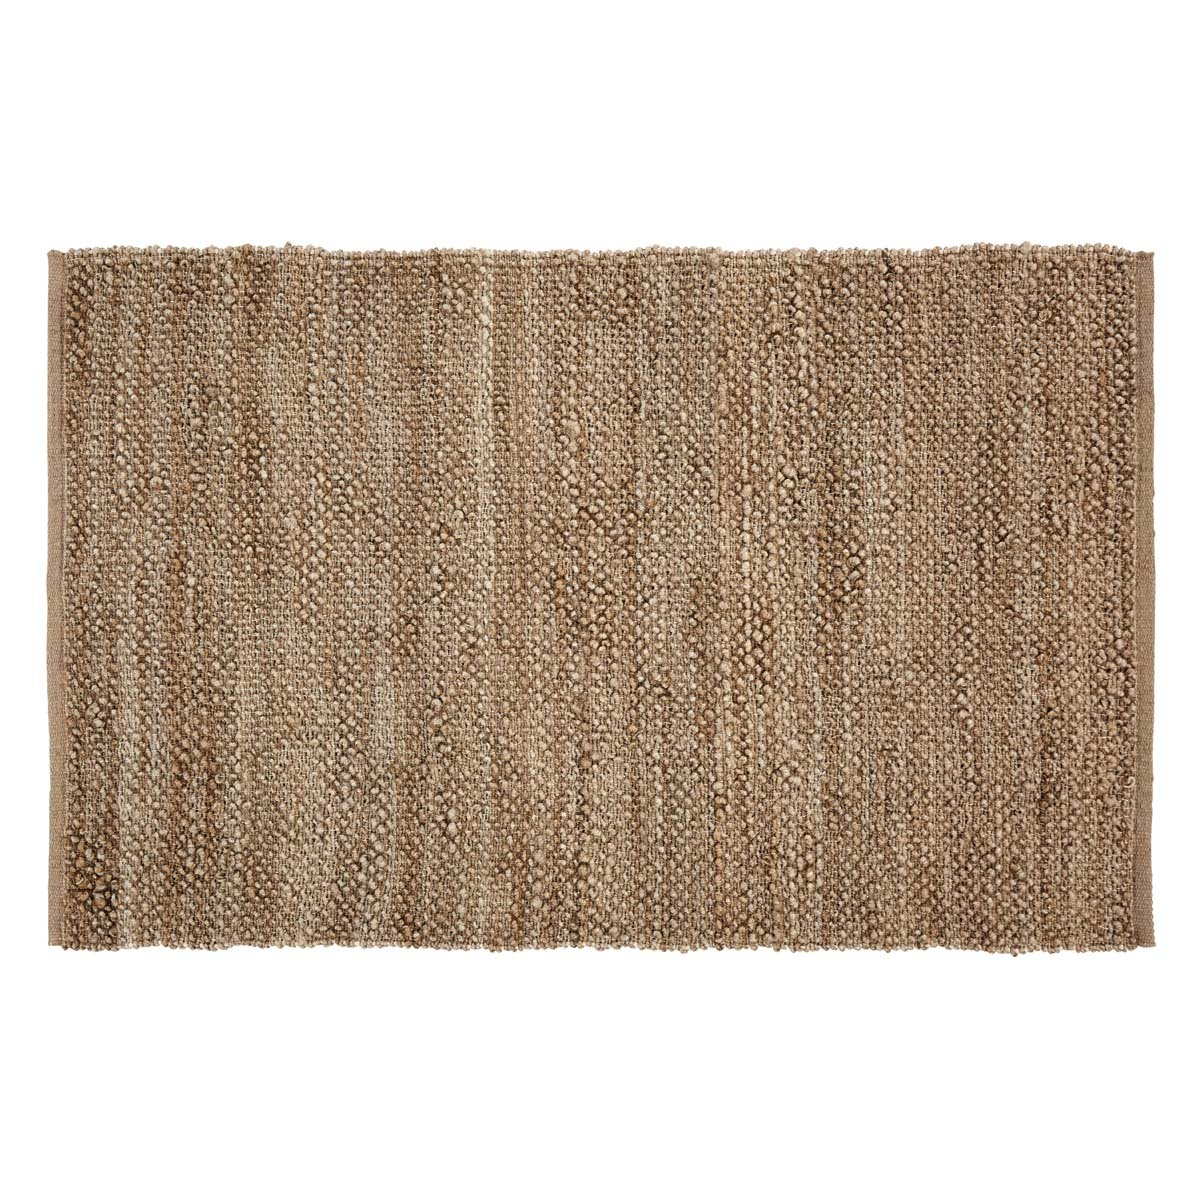 VHC Brands 29008 Curtain Panel Pair, 3 x 5 , Creme